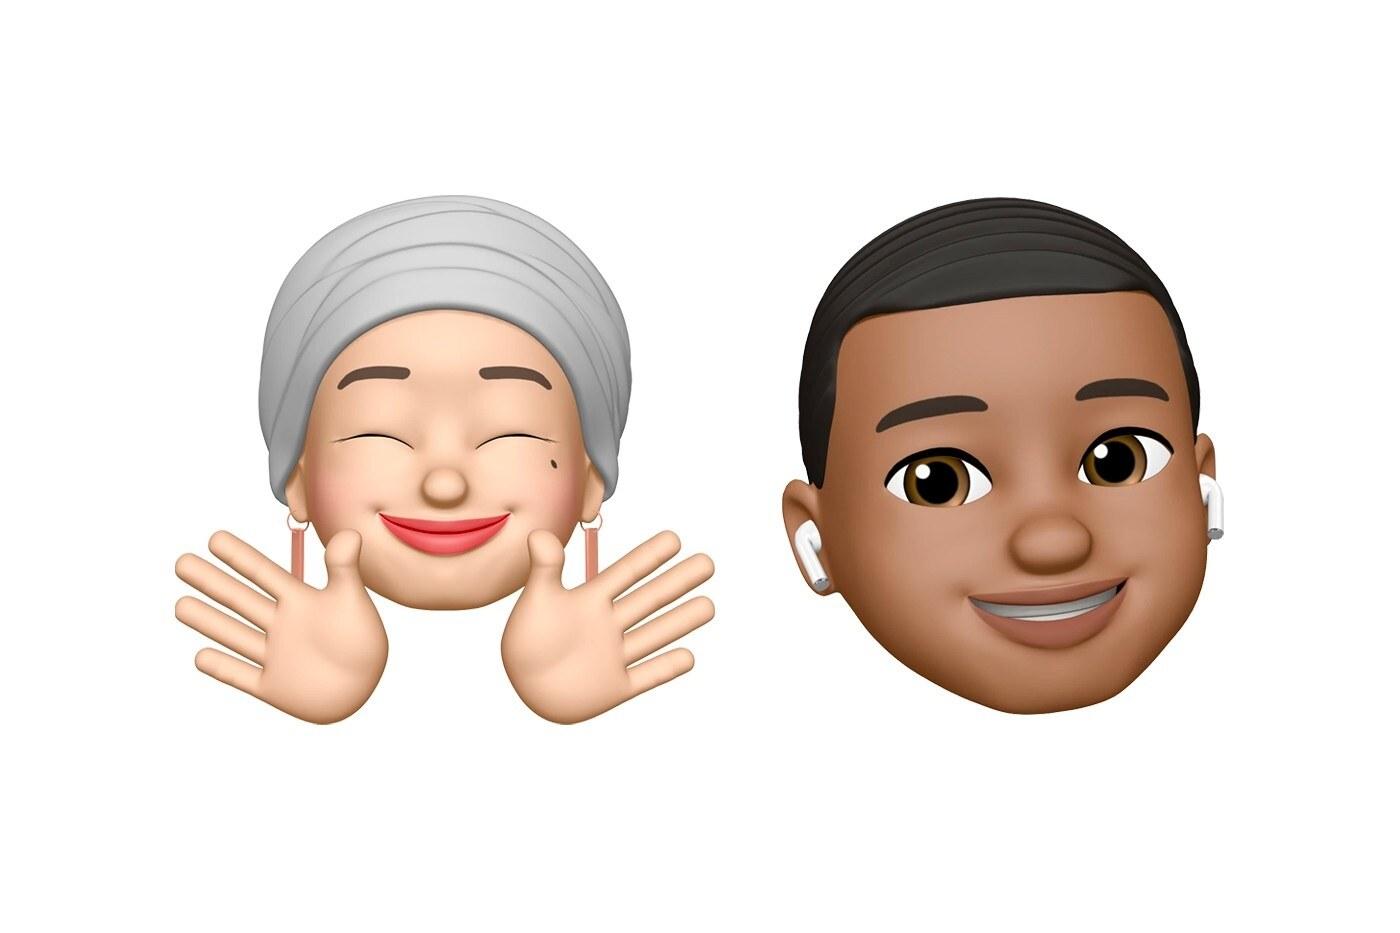 iOS 14.5 new emojis